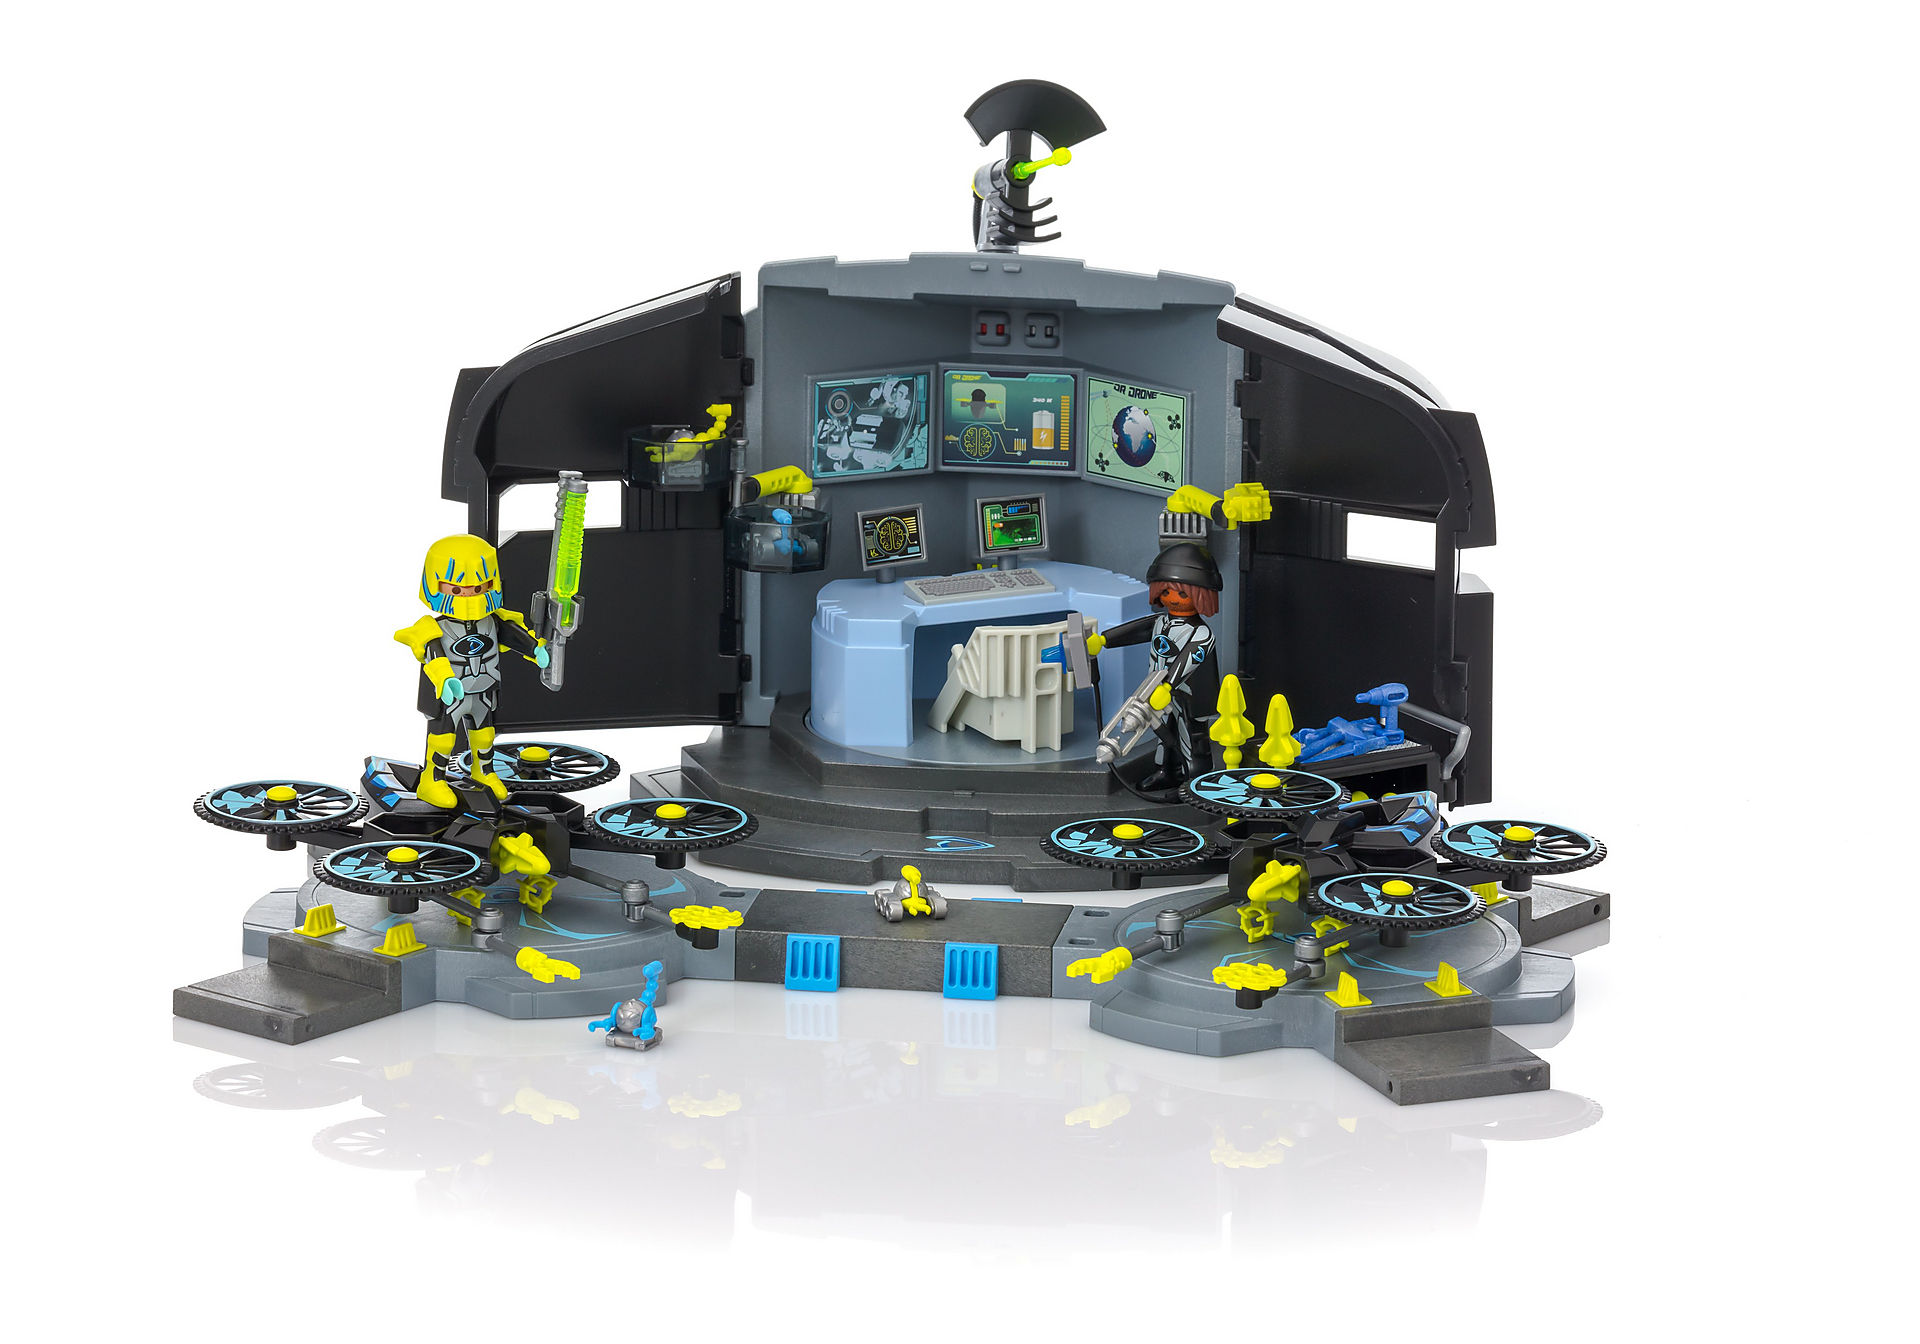 360degree image 2